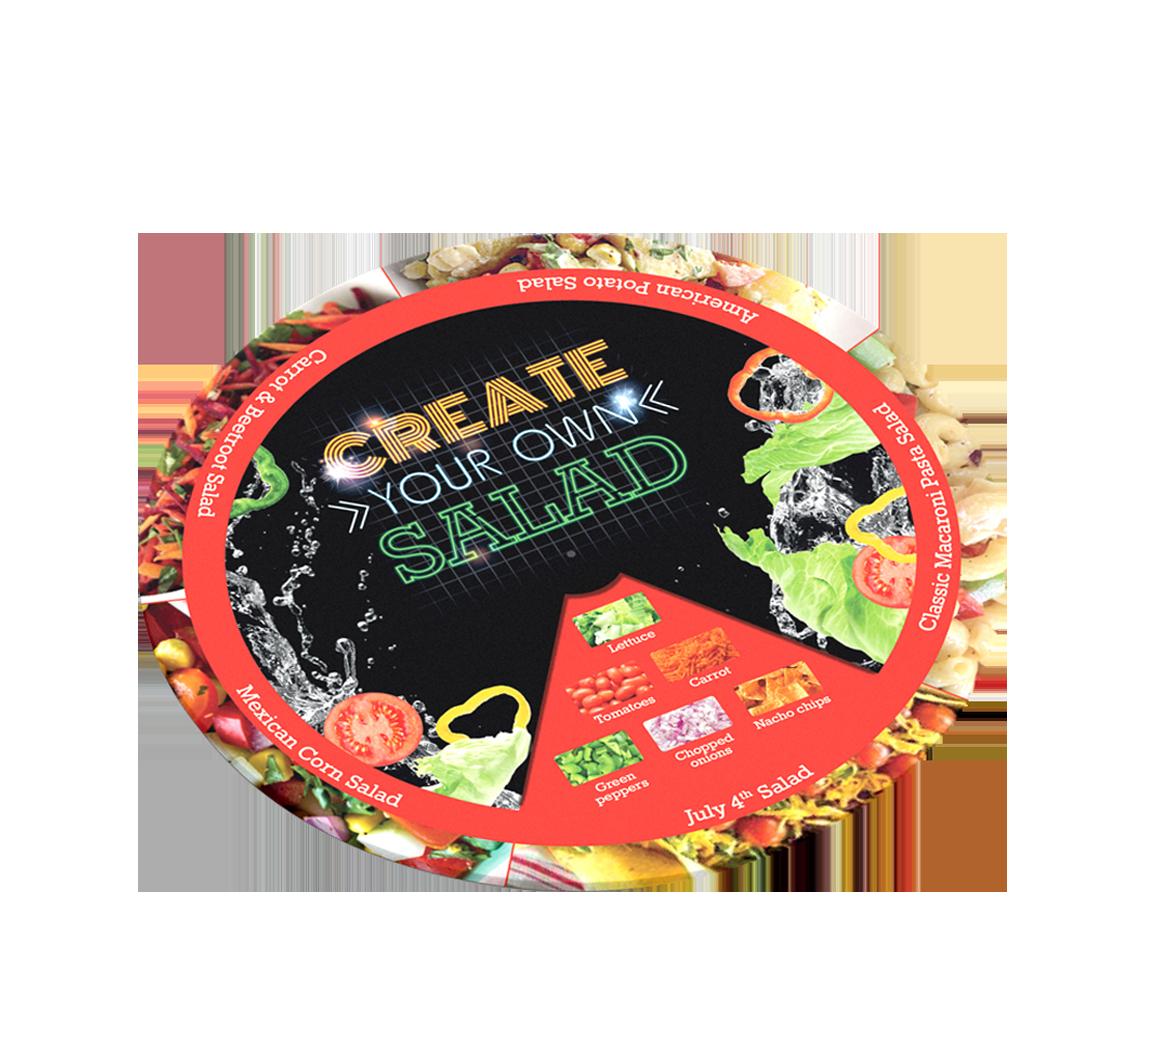 product label design, packaging design